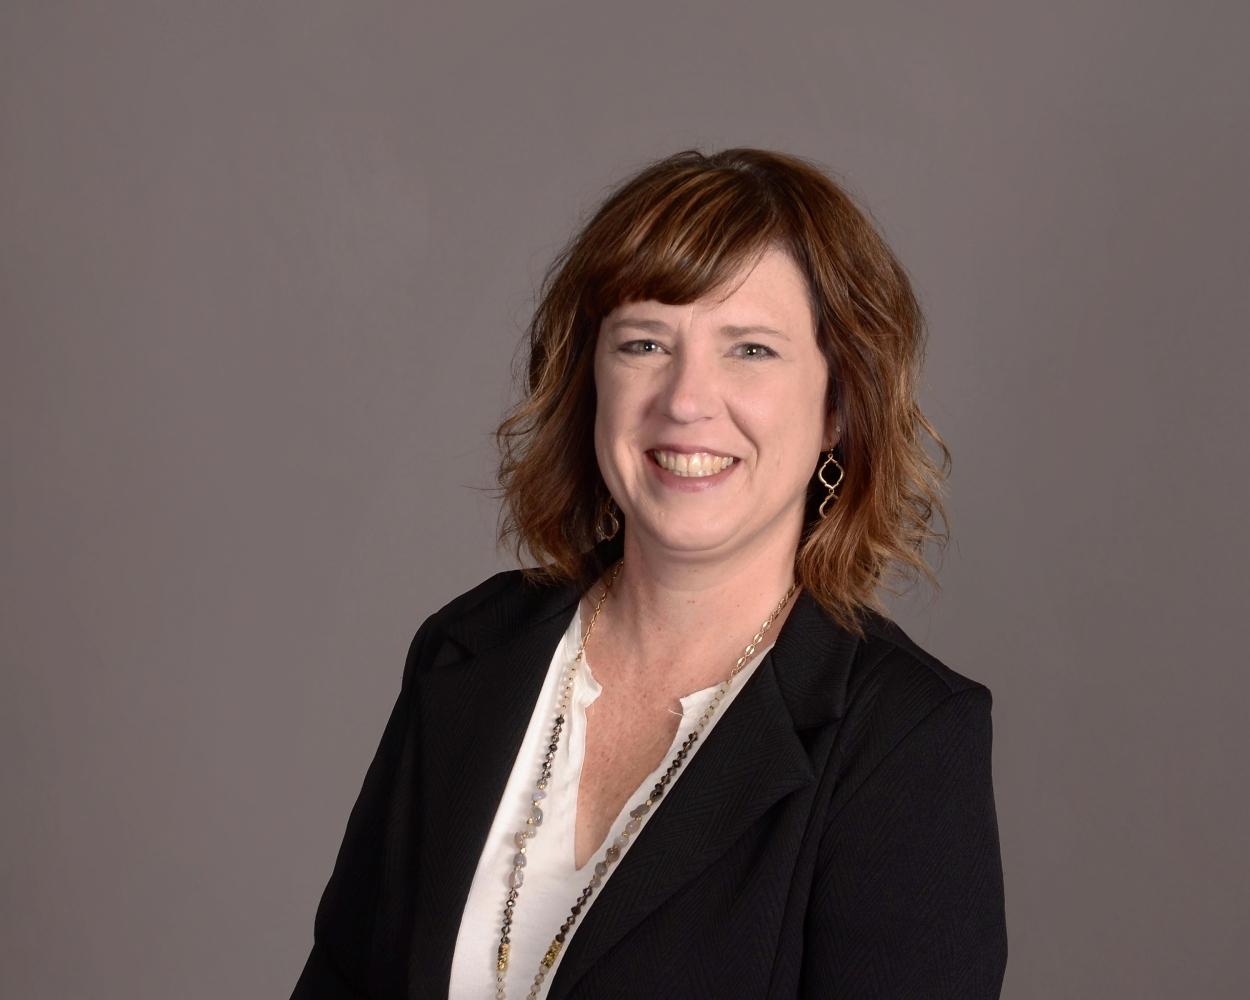 Brenda (Stevens) Sand, Interim Christian Education Director